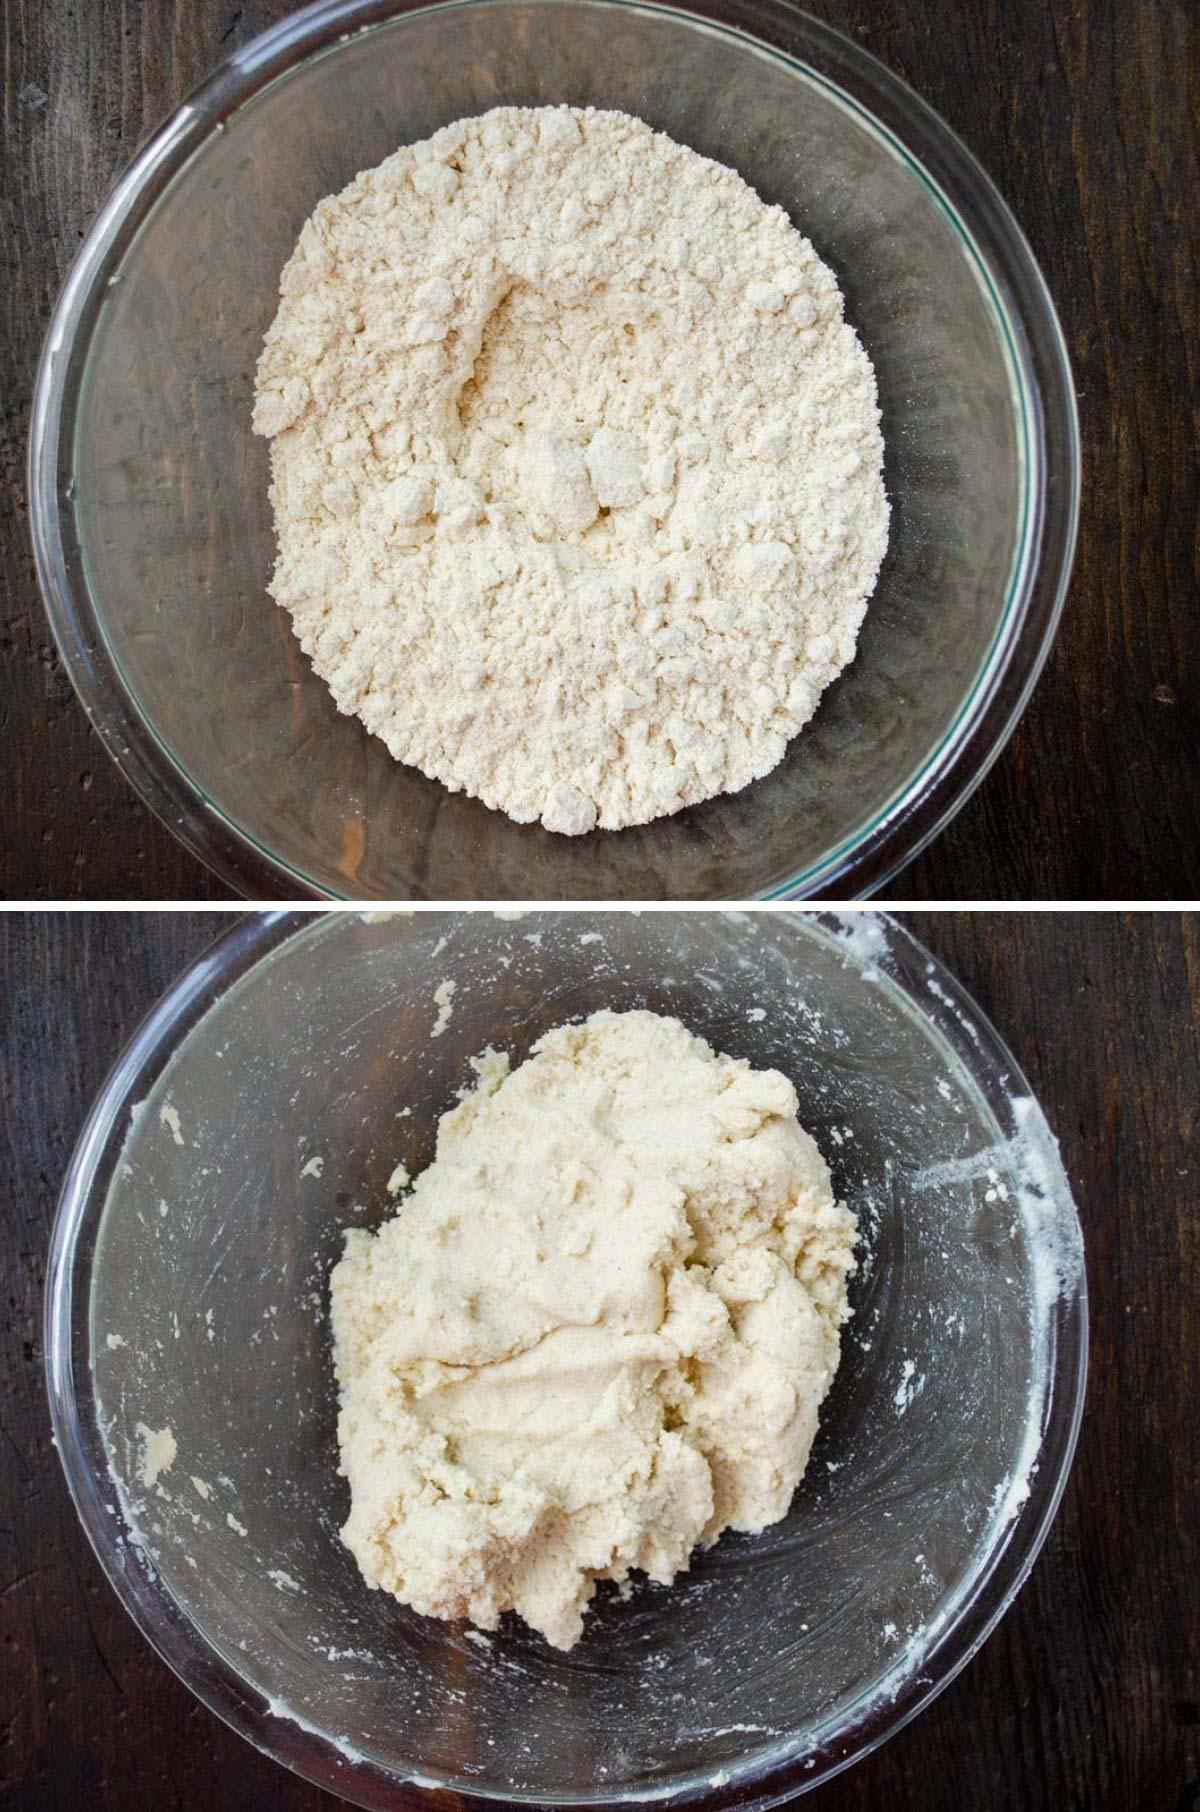 from top to bottom, glass bowl full of masa harina, masa harina mixed with water to make dough